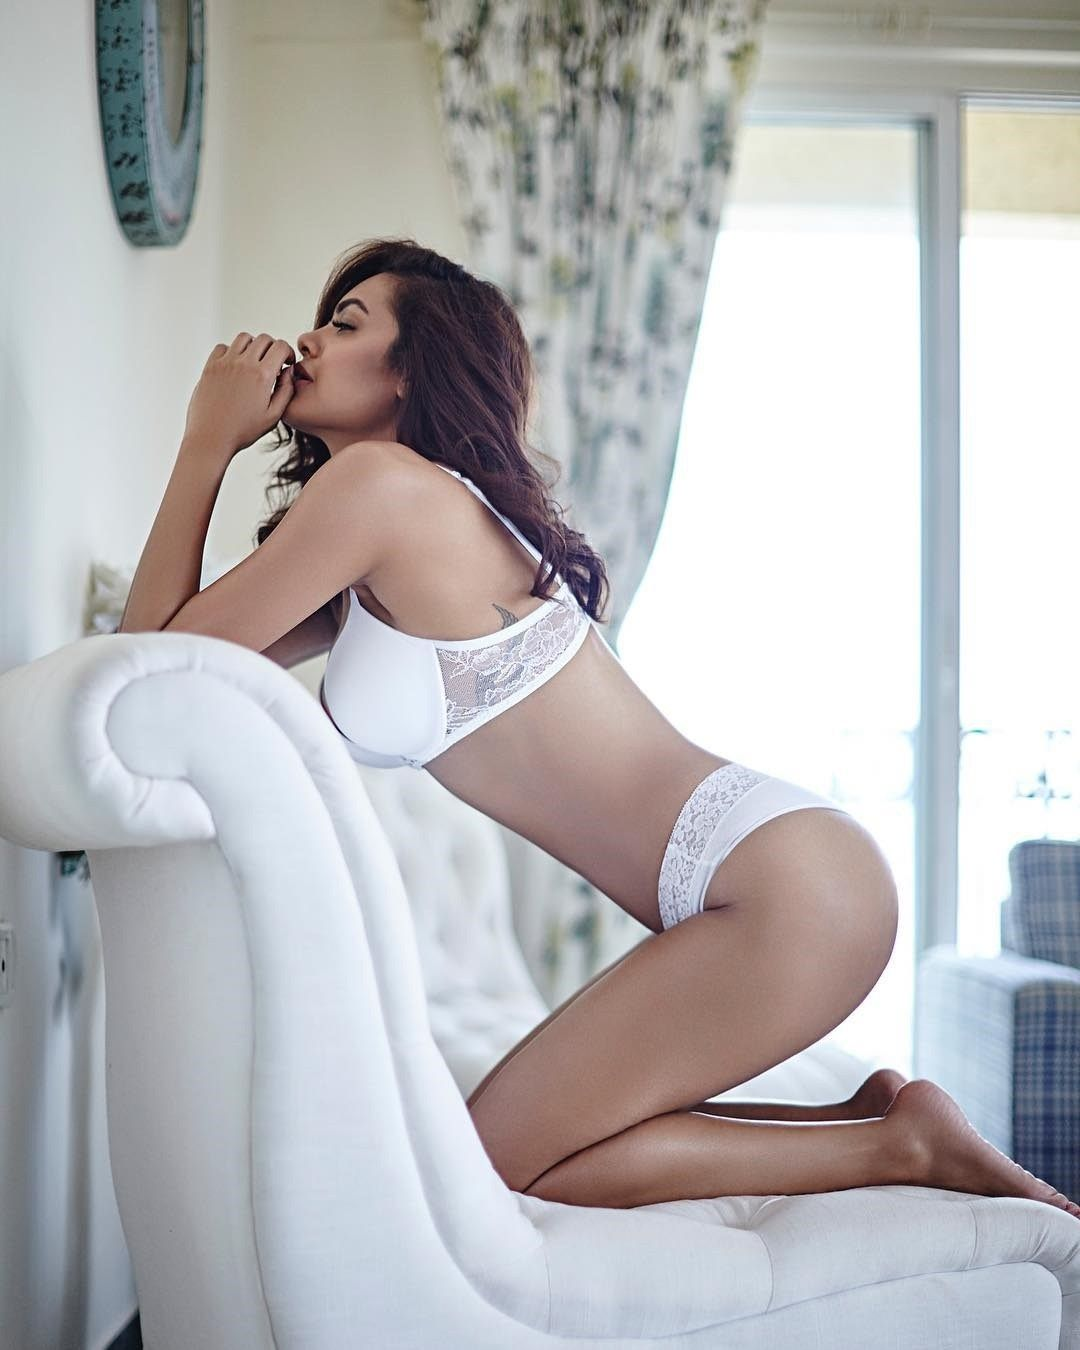 Esha Gupta Instagram Lusty Hot Sexy Viral Semi Nude Hq Photos